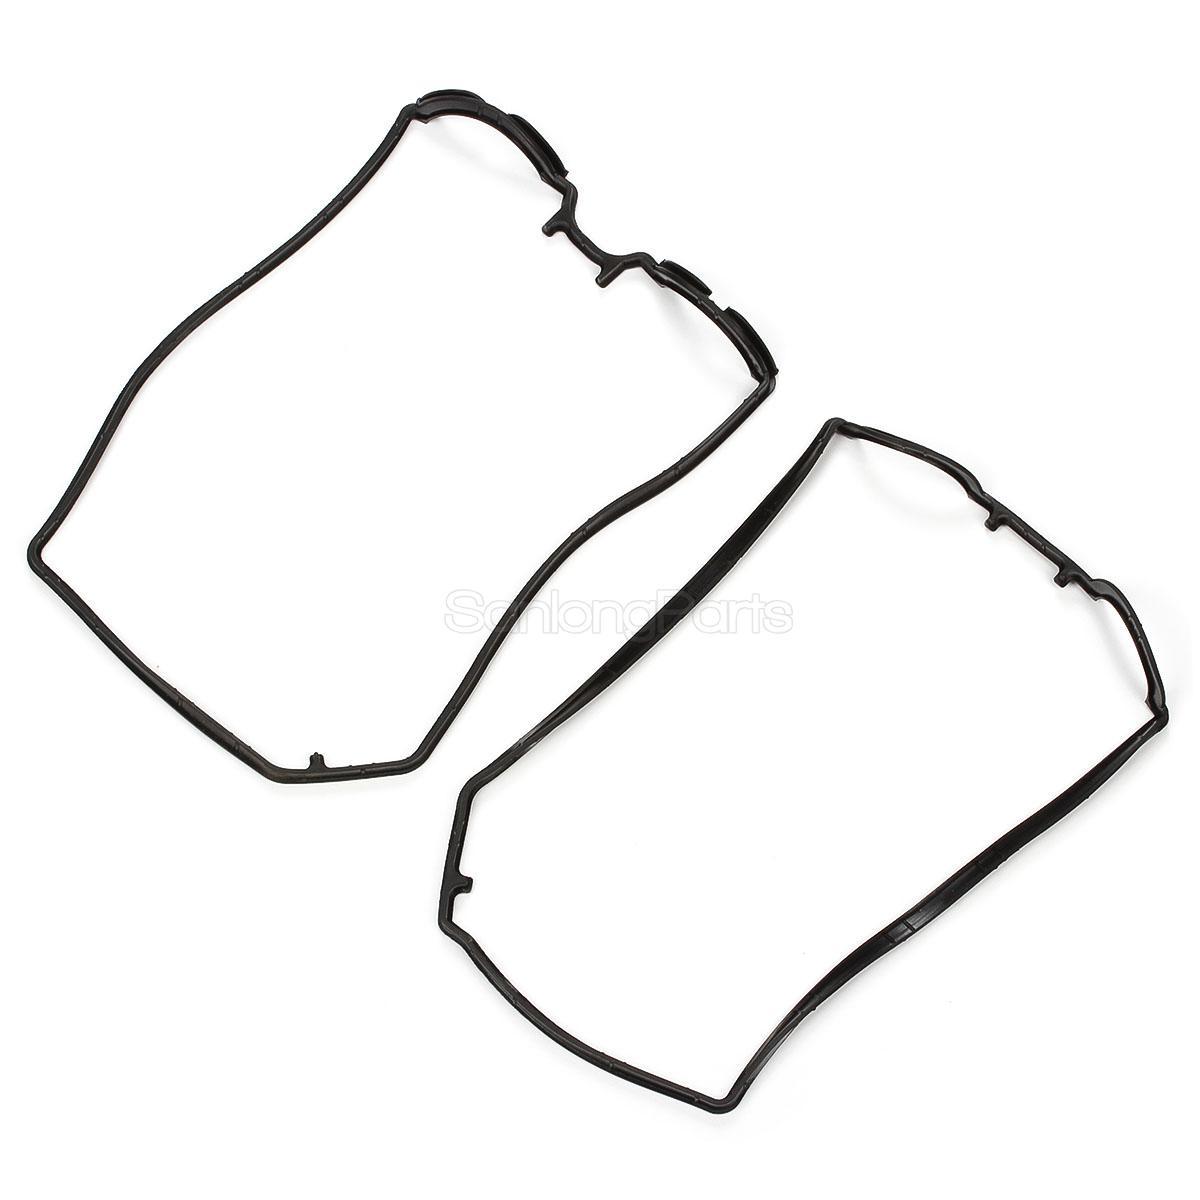 Valve Cover Gasket Kit Fits Subaru Impreza Wrx 2 0l Ej205